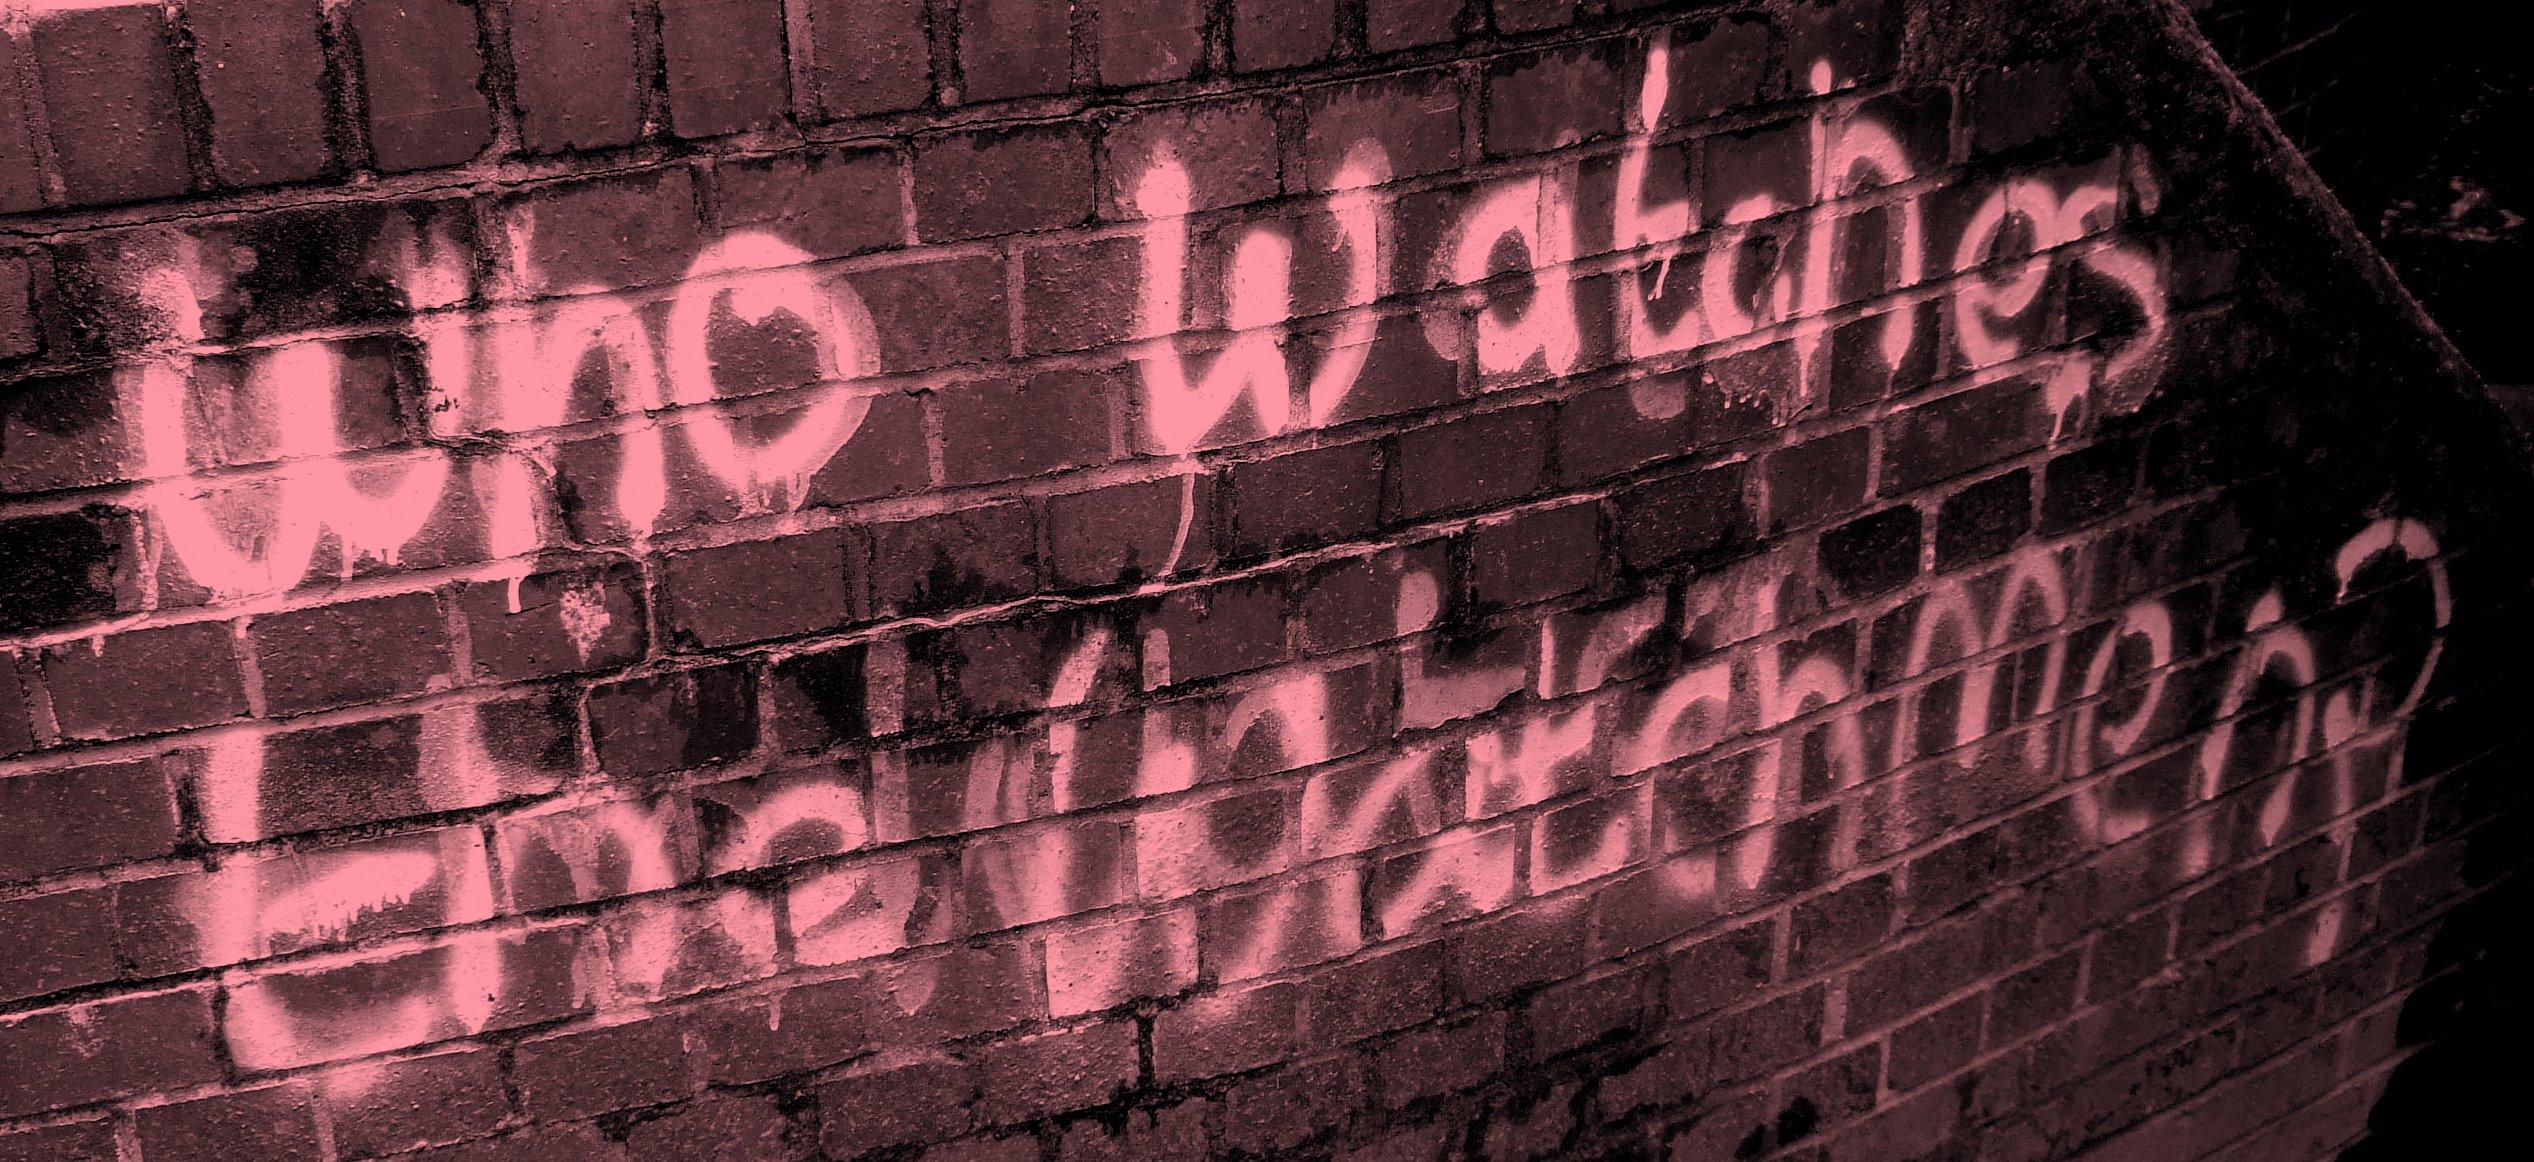 Who watches the watchmen graffiti